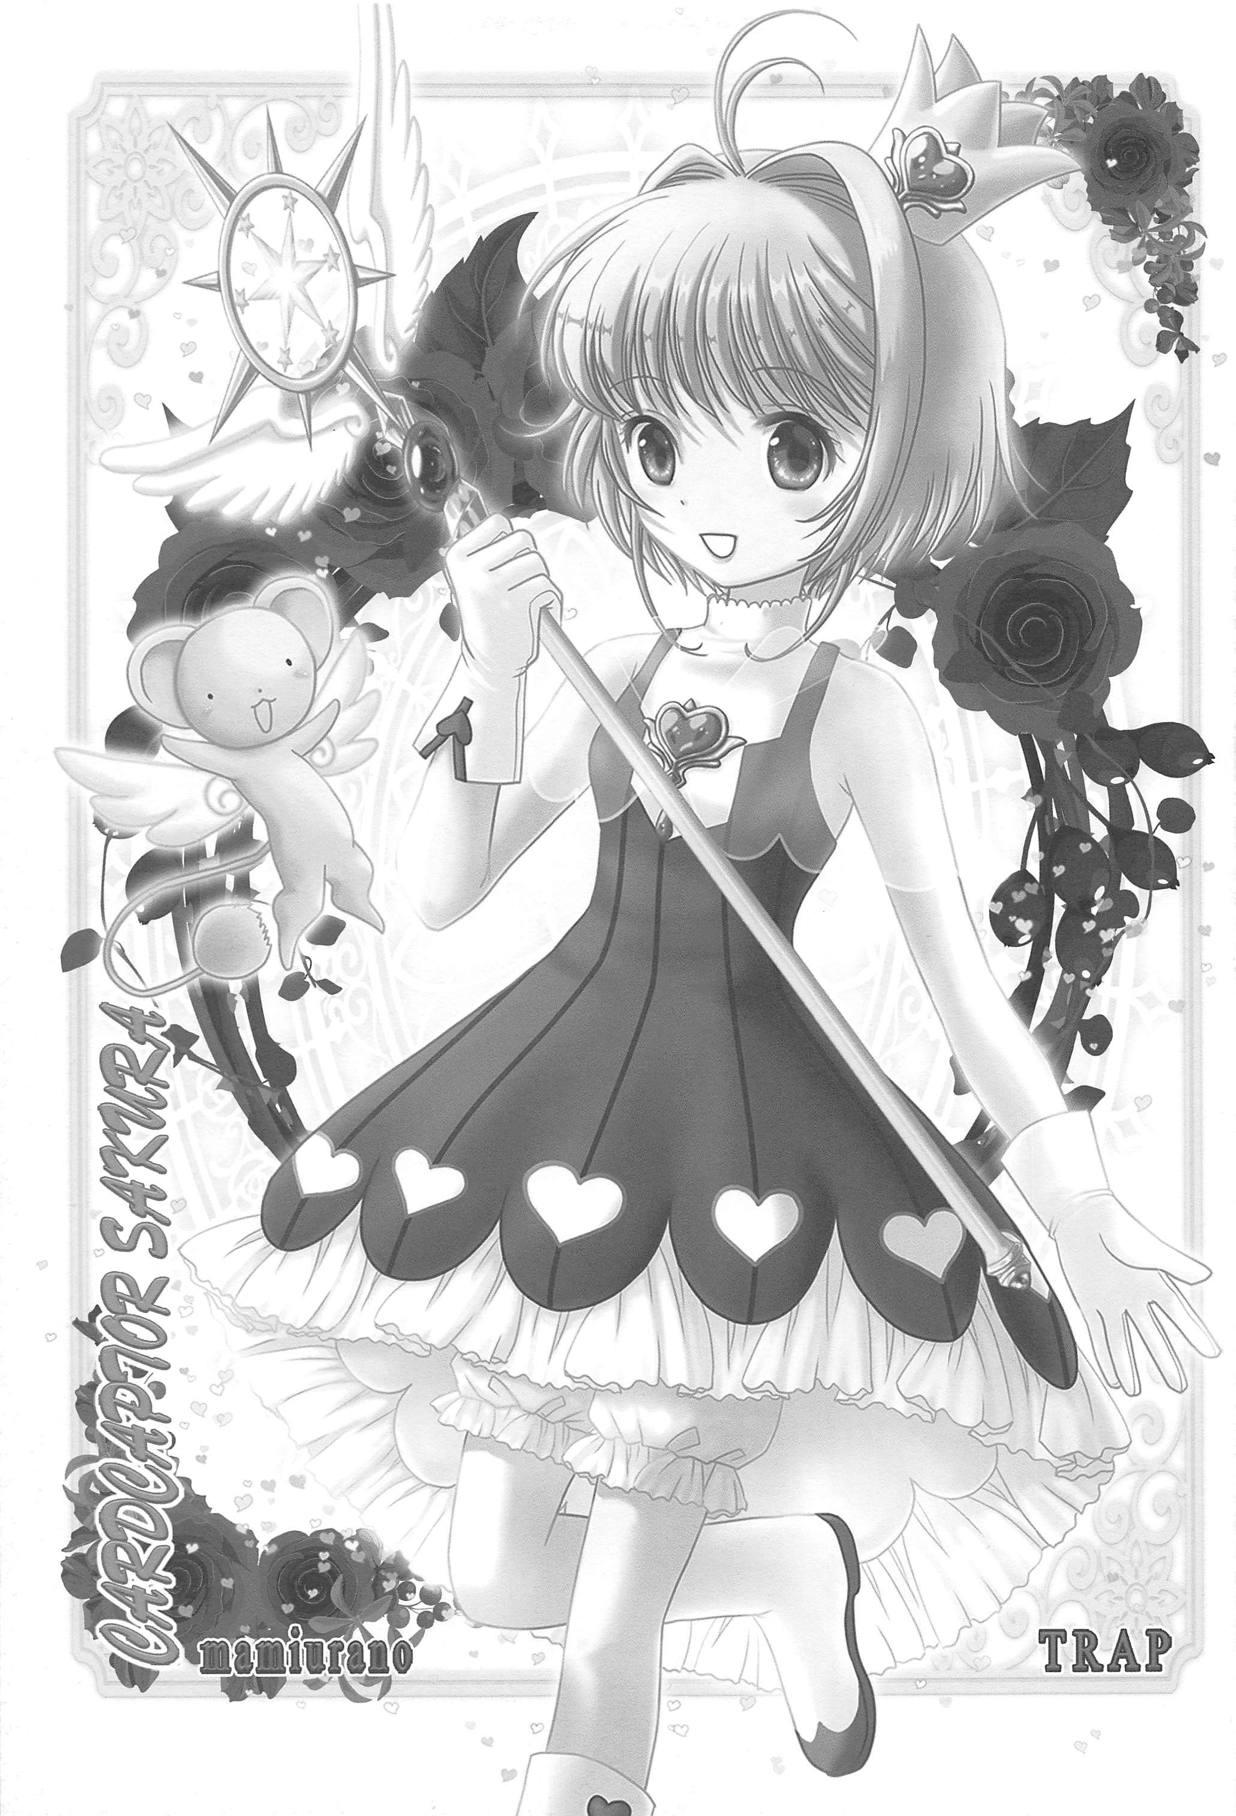 (C95) [TRAP (Urano Mami)] SAO ~sokoni anatato omoideto~ ETERNAL (Sword Art Online) 27